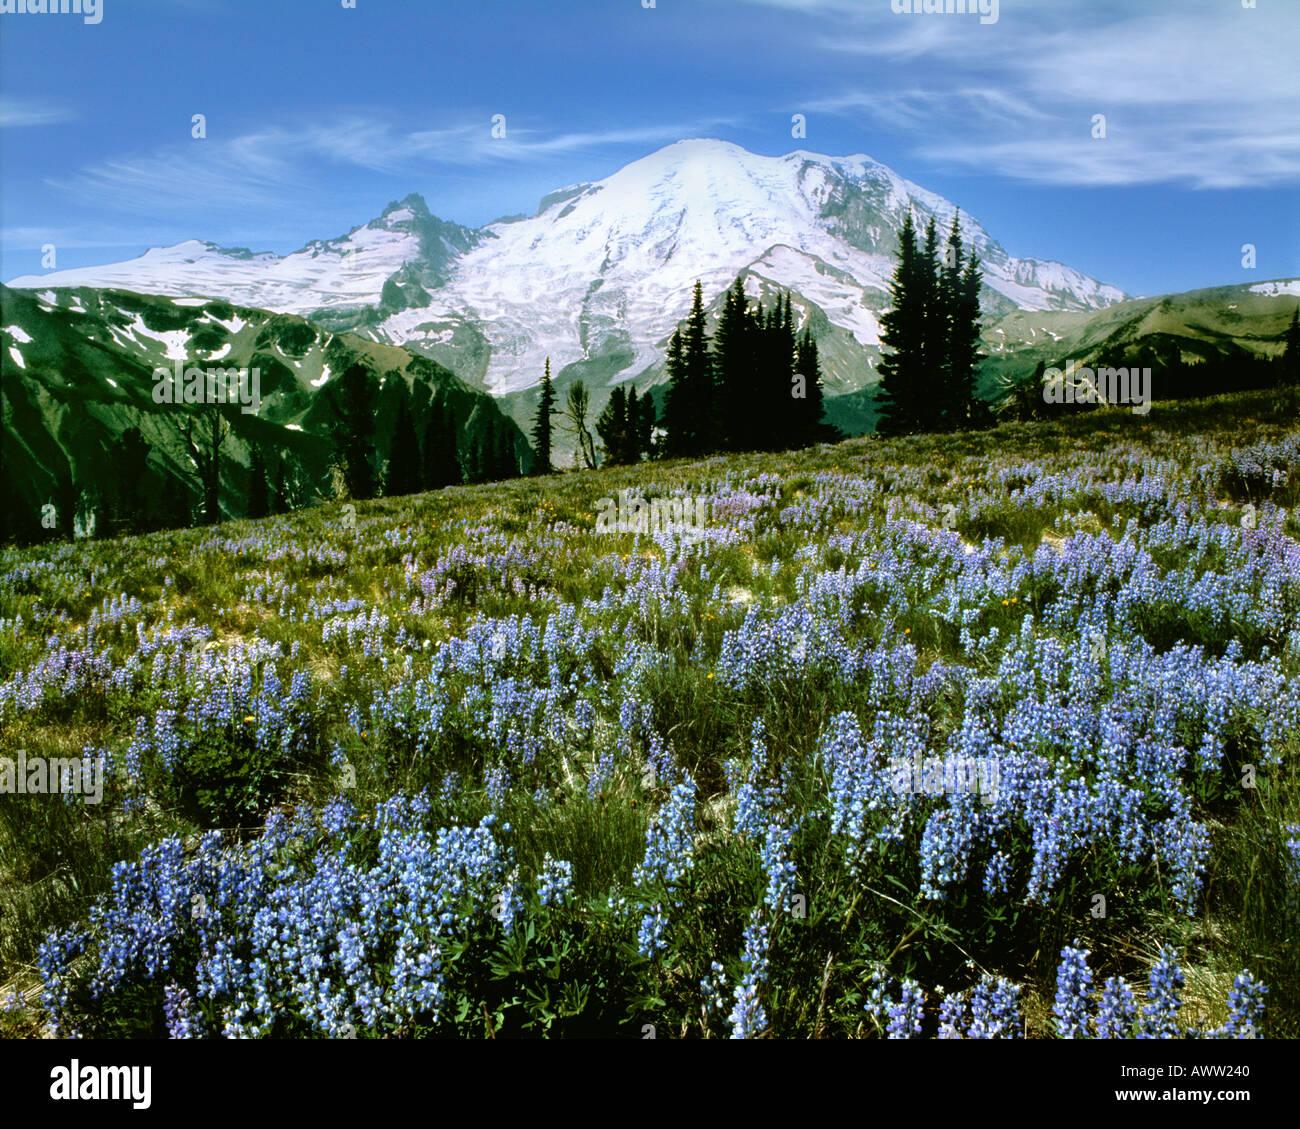 USA - WASHINGTON: Mount Rainier National Park - Stock Image